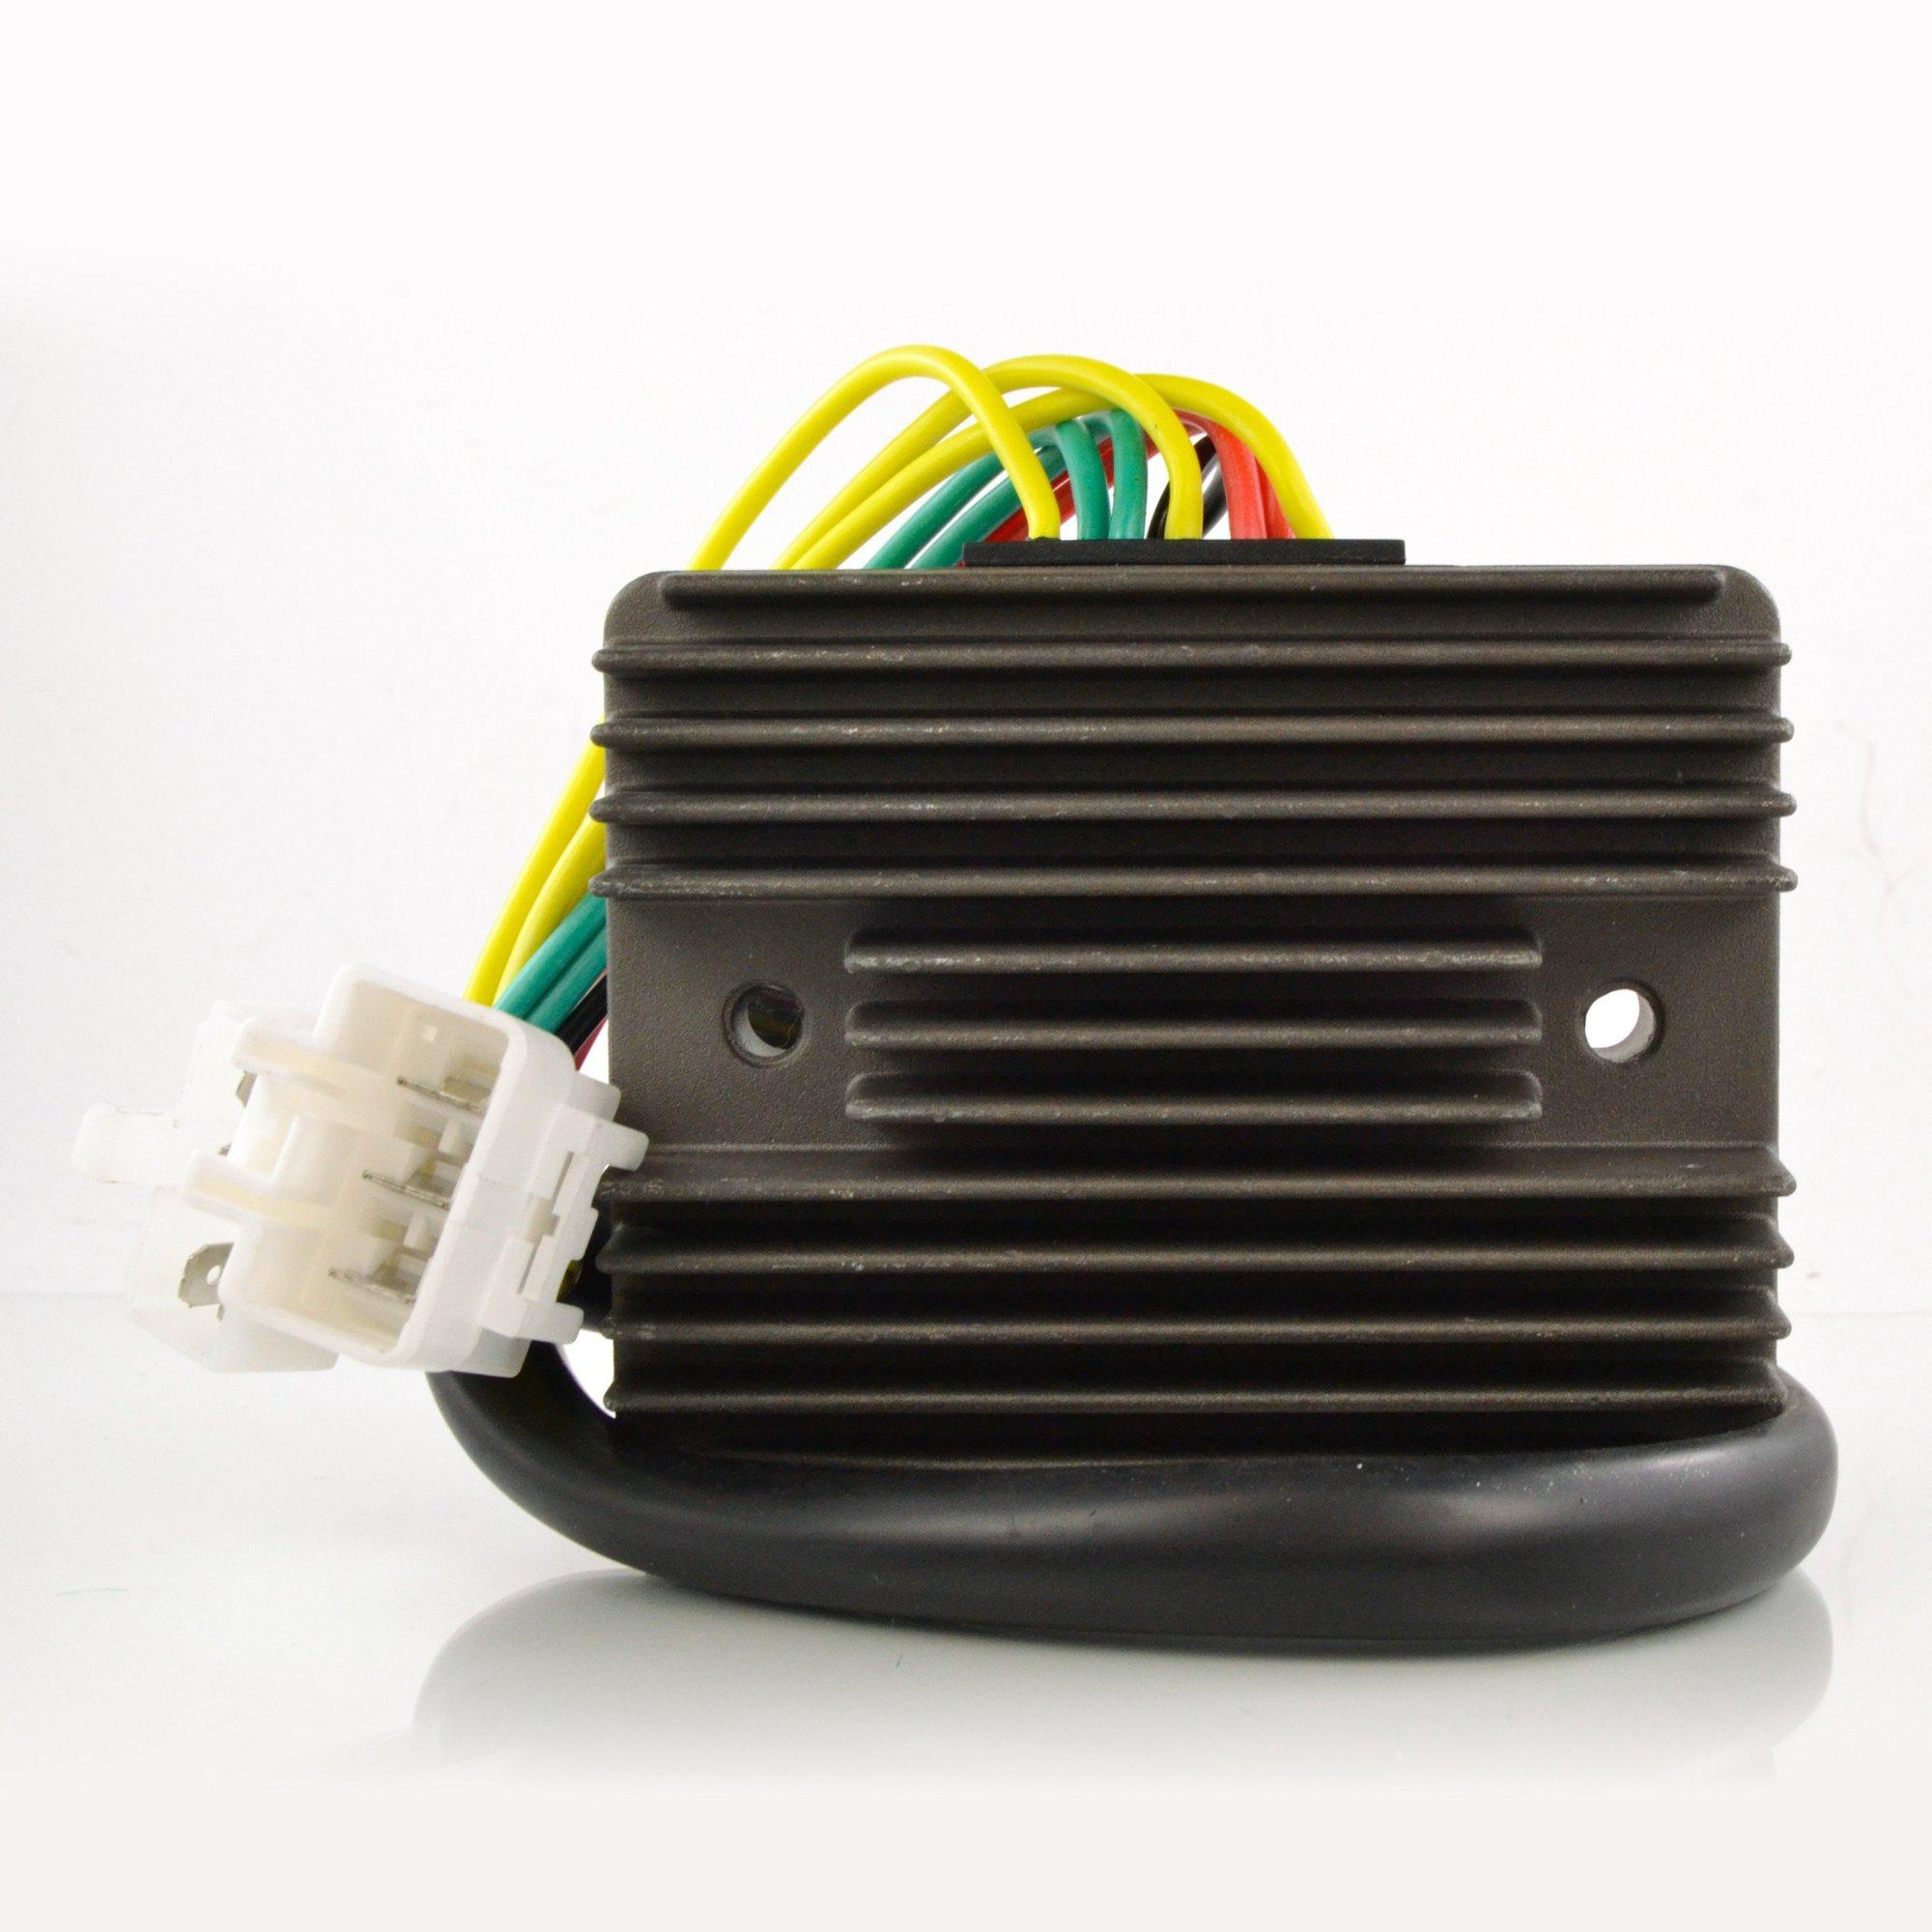 hight resolution of voltage regulator rectifier honda cbr 1100 xx moto electrical cbr1100xx rectifier wiring diagram